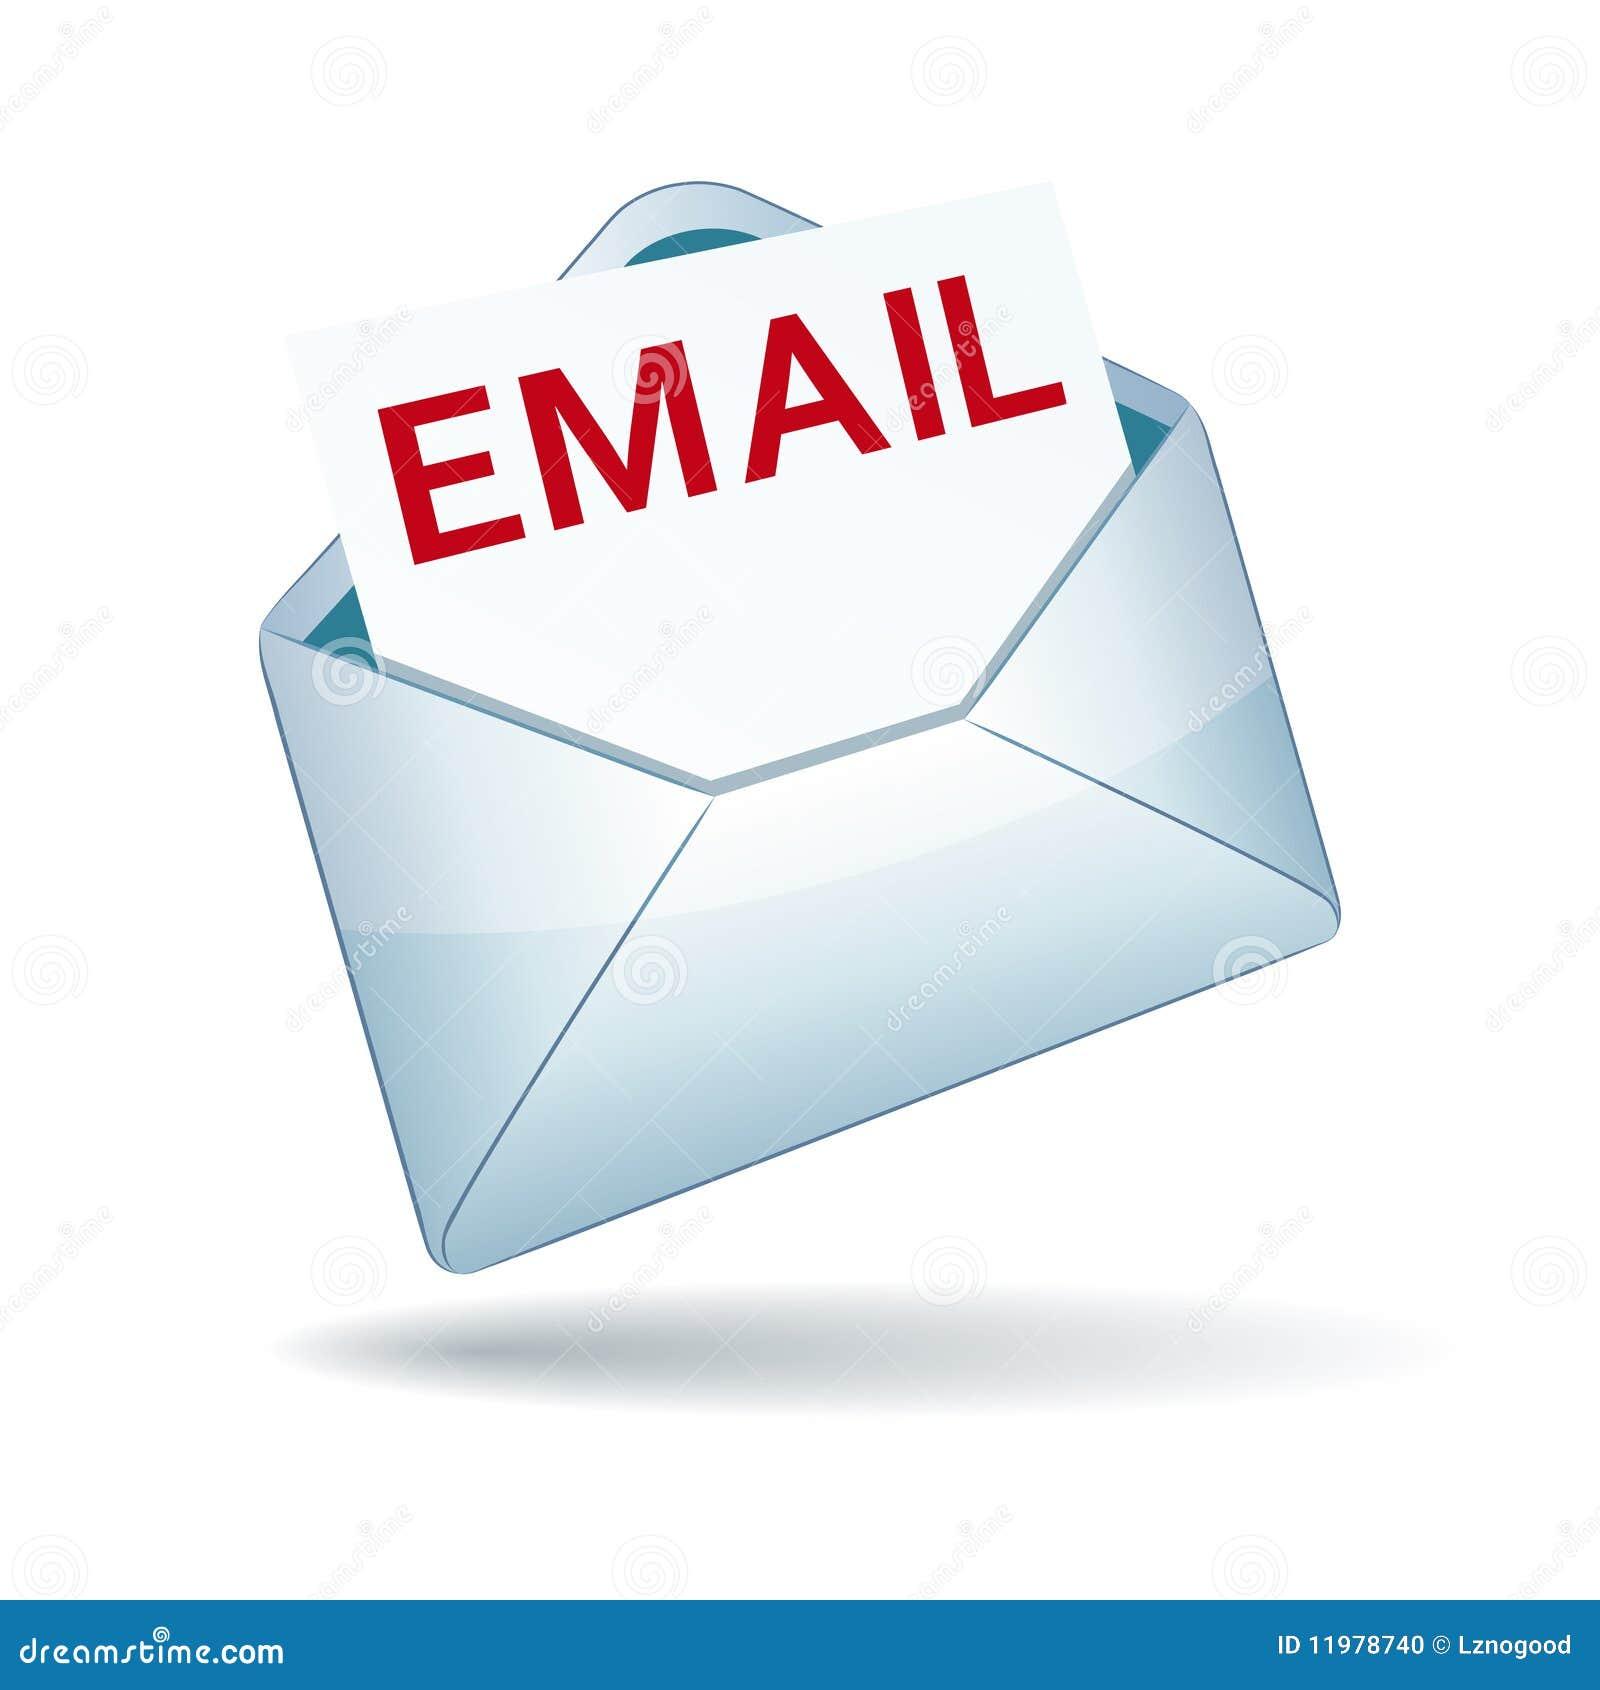 email icon stock vector illustration of postage communication 11978740. Black Bedroom Furniture Sets. Home Design Ideas